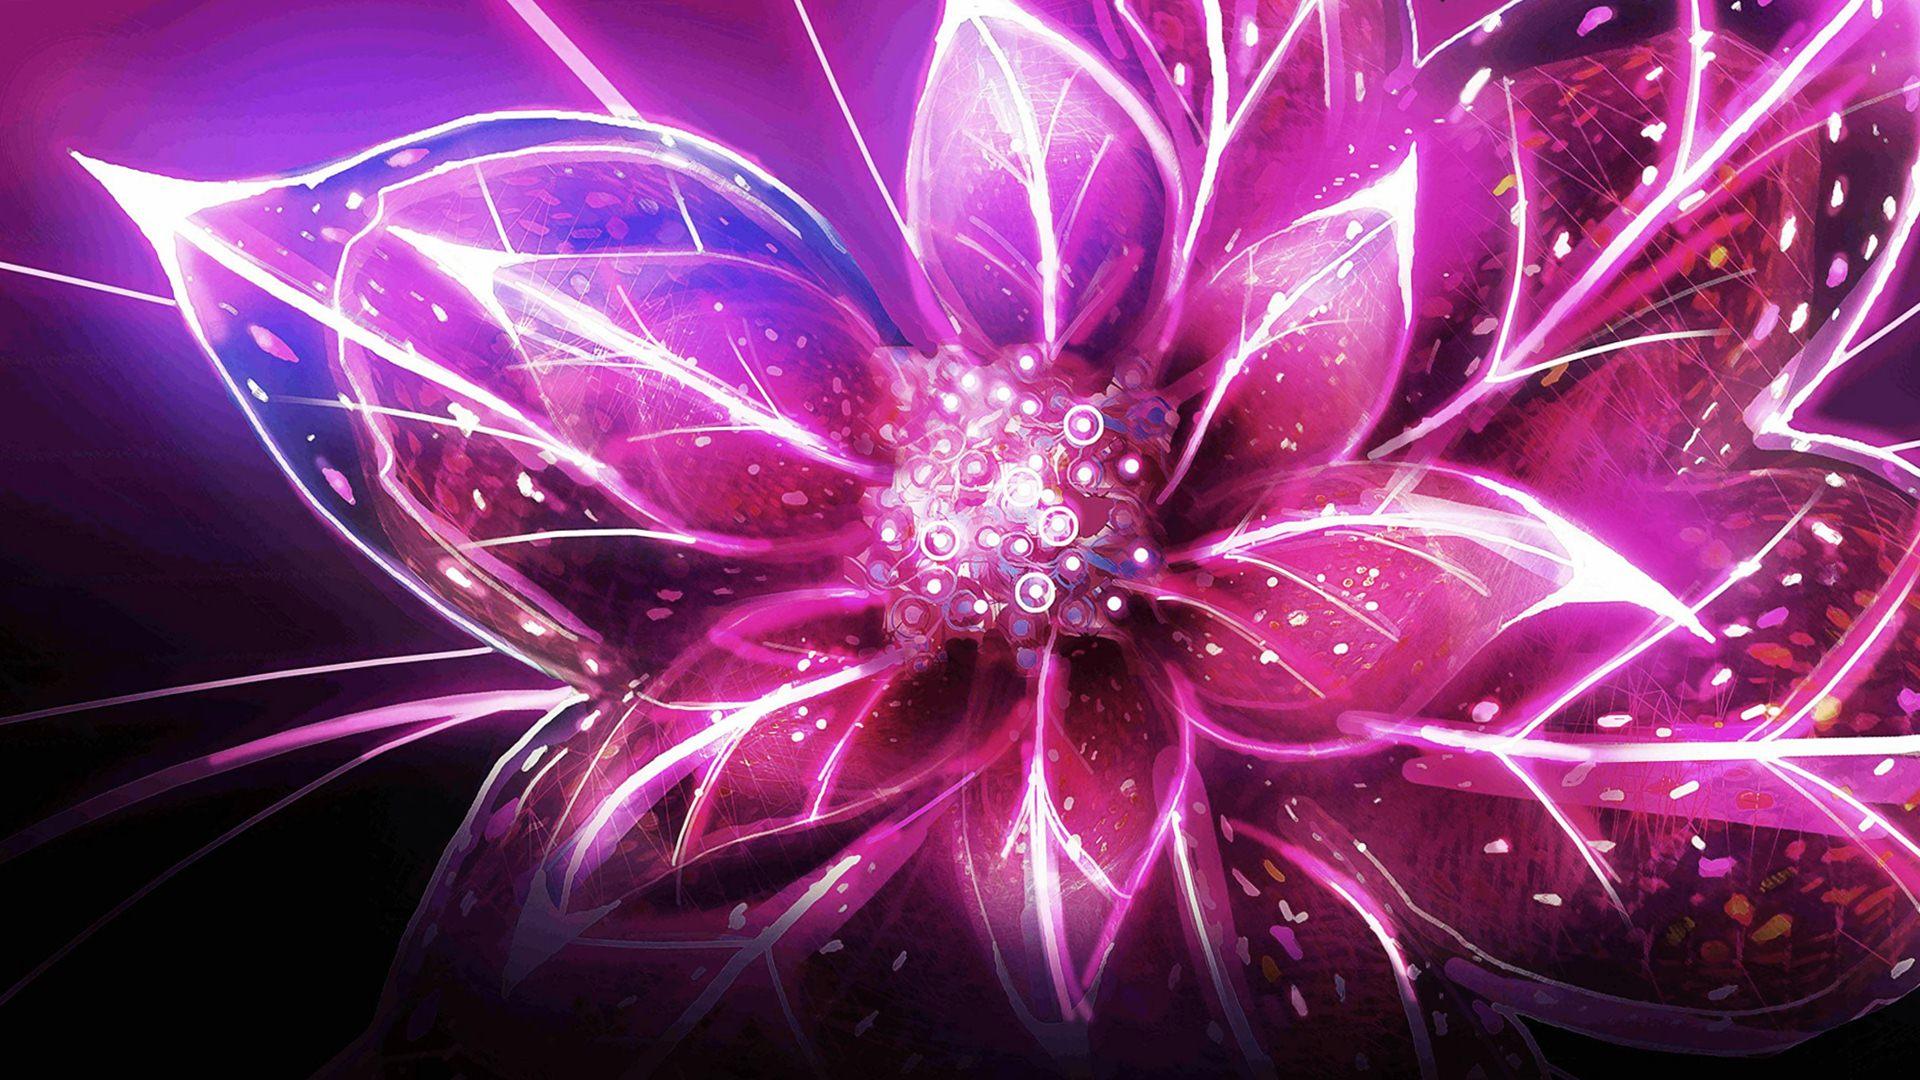 image - flowers-3d-diugital-purple-wallpapers | fantastic